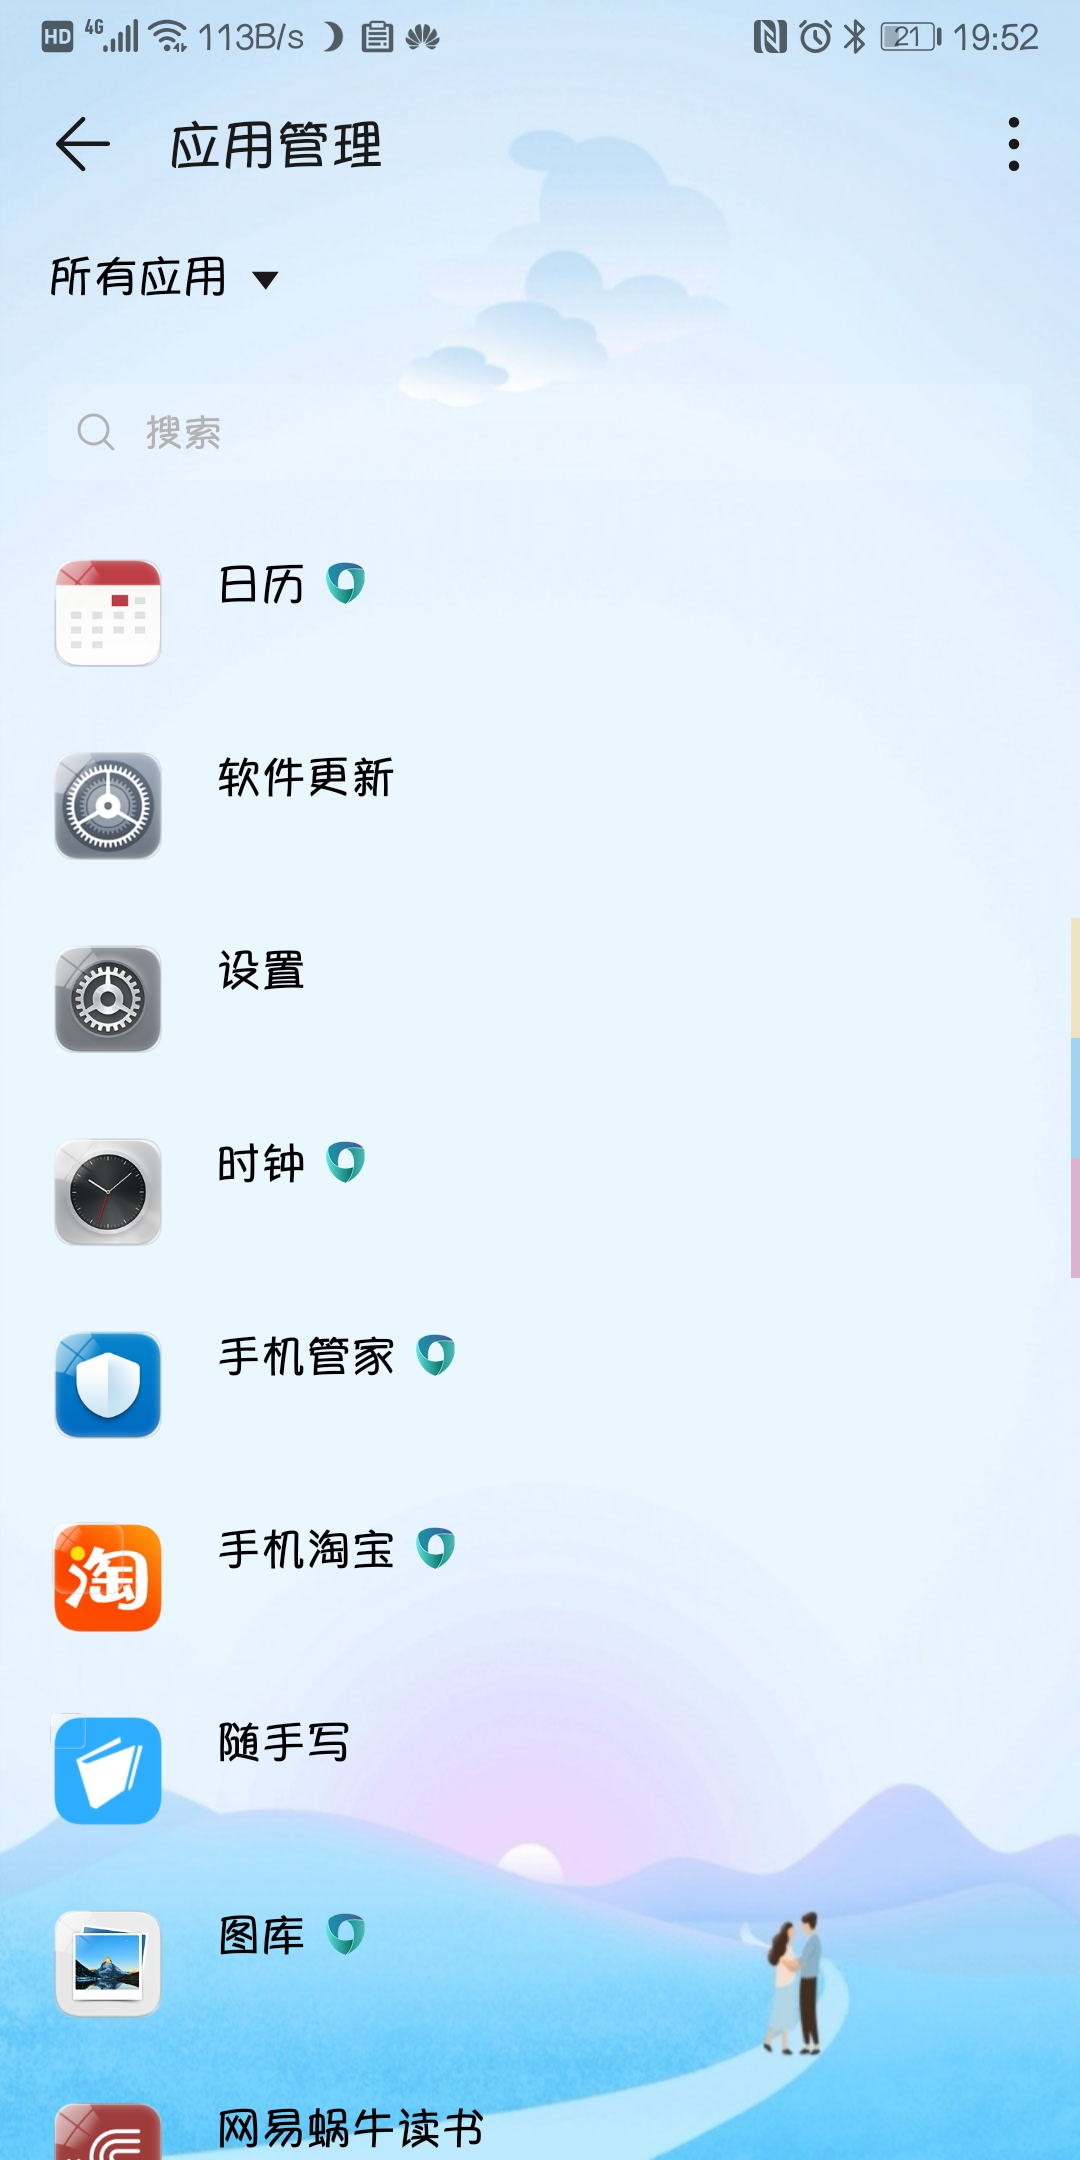 Screenshot_20190630_195256_com.android.settings.jpg